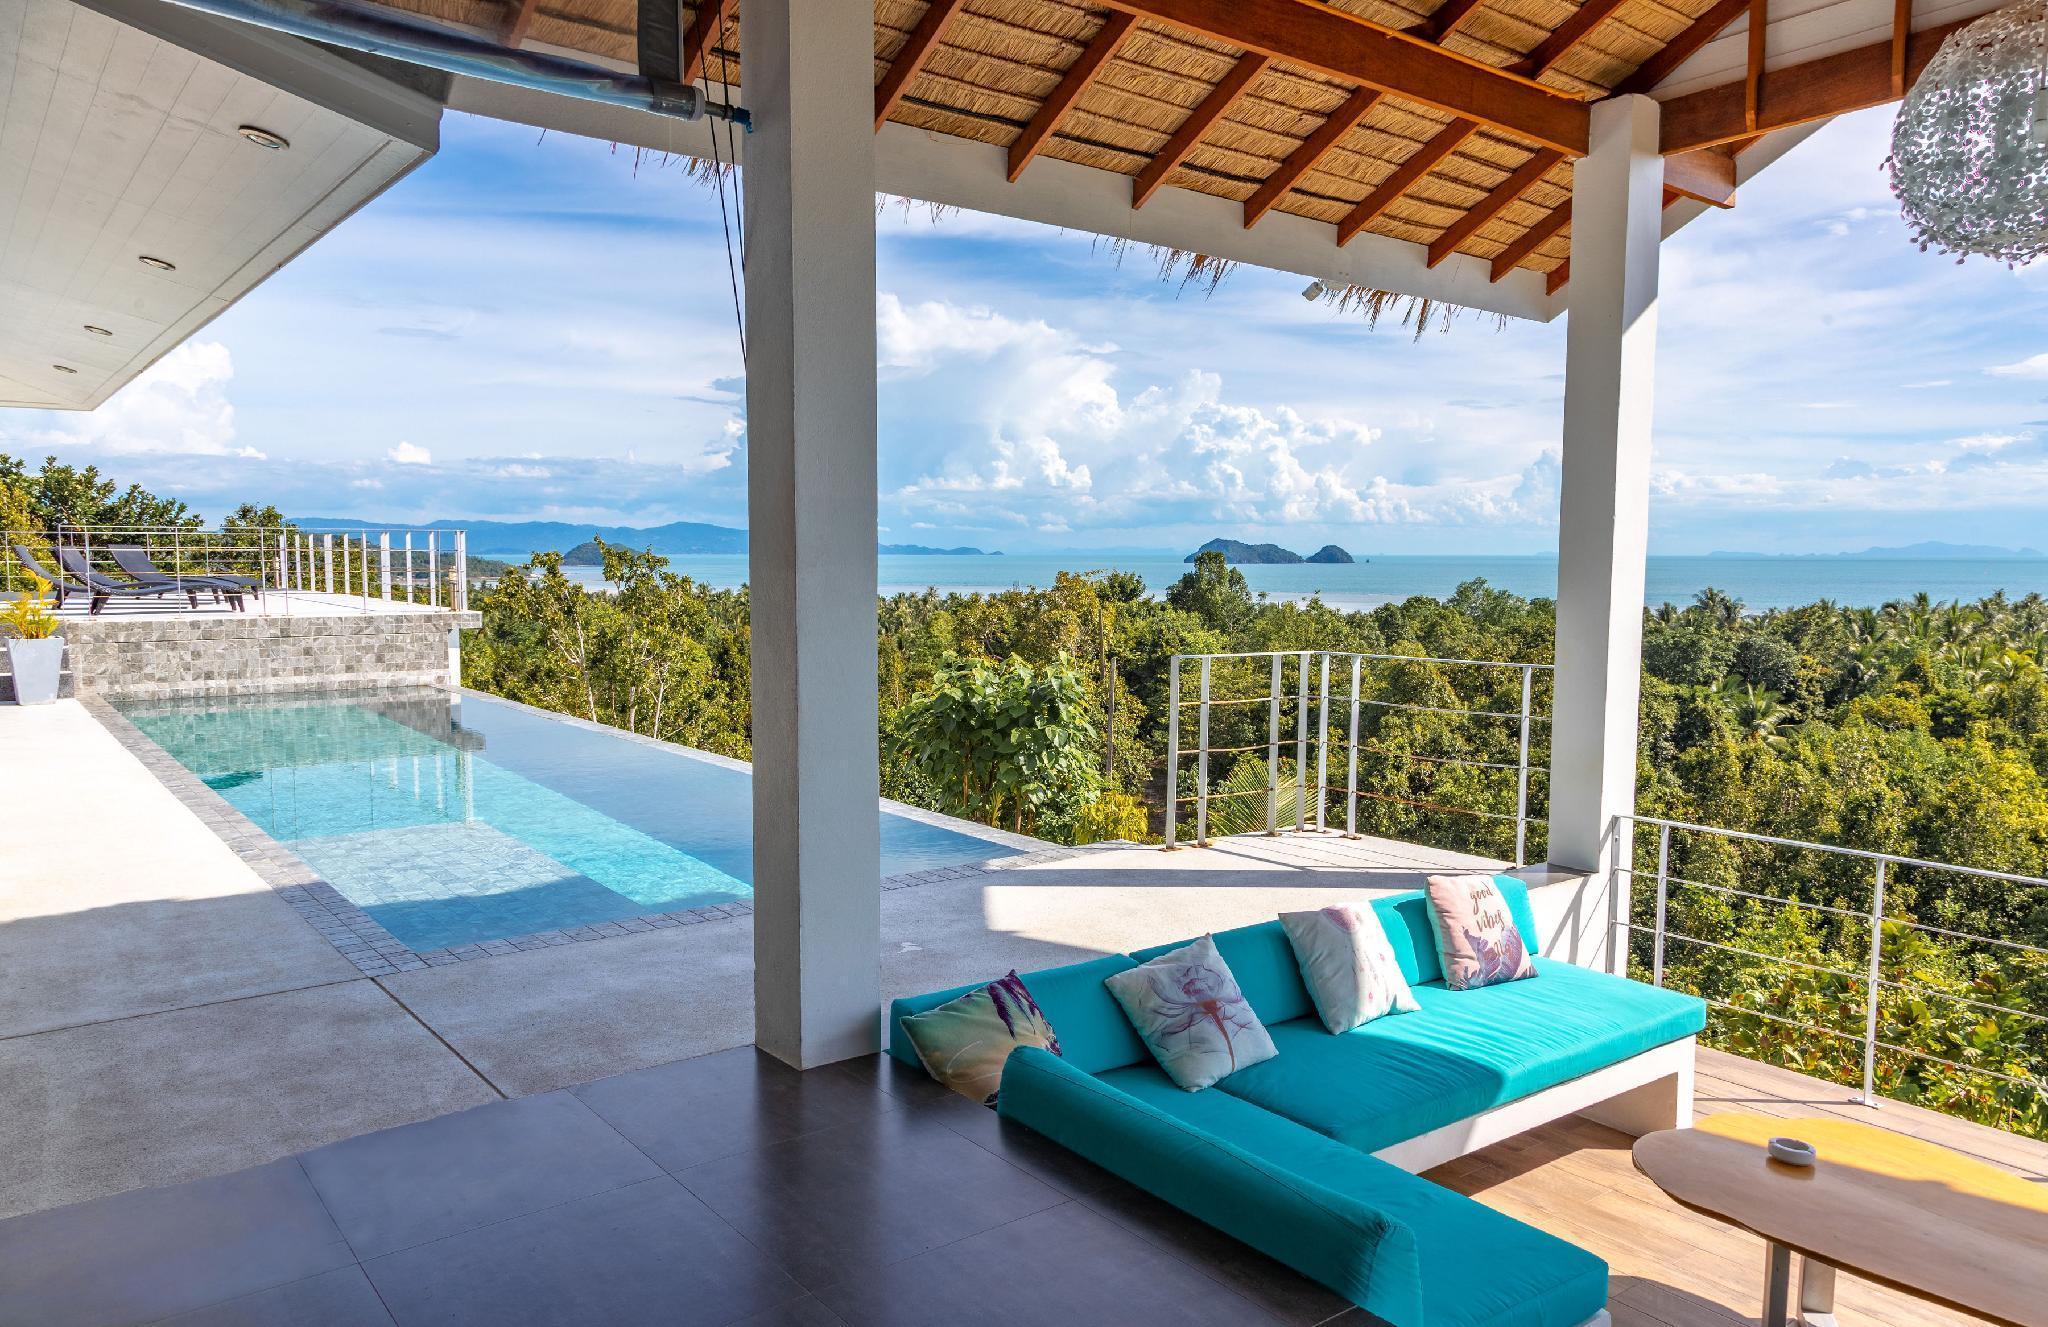 Shades of Blue - Tropical chic sea view villa วิลลา 4 ห้องนอน 4 ห้องน้ำส่วนตัว ขนาด 300 ตร.ม. – ศรีธนู